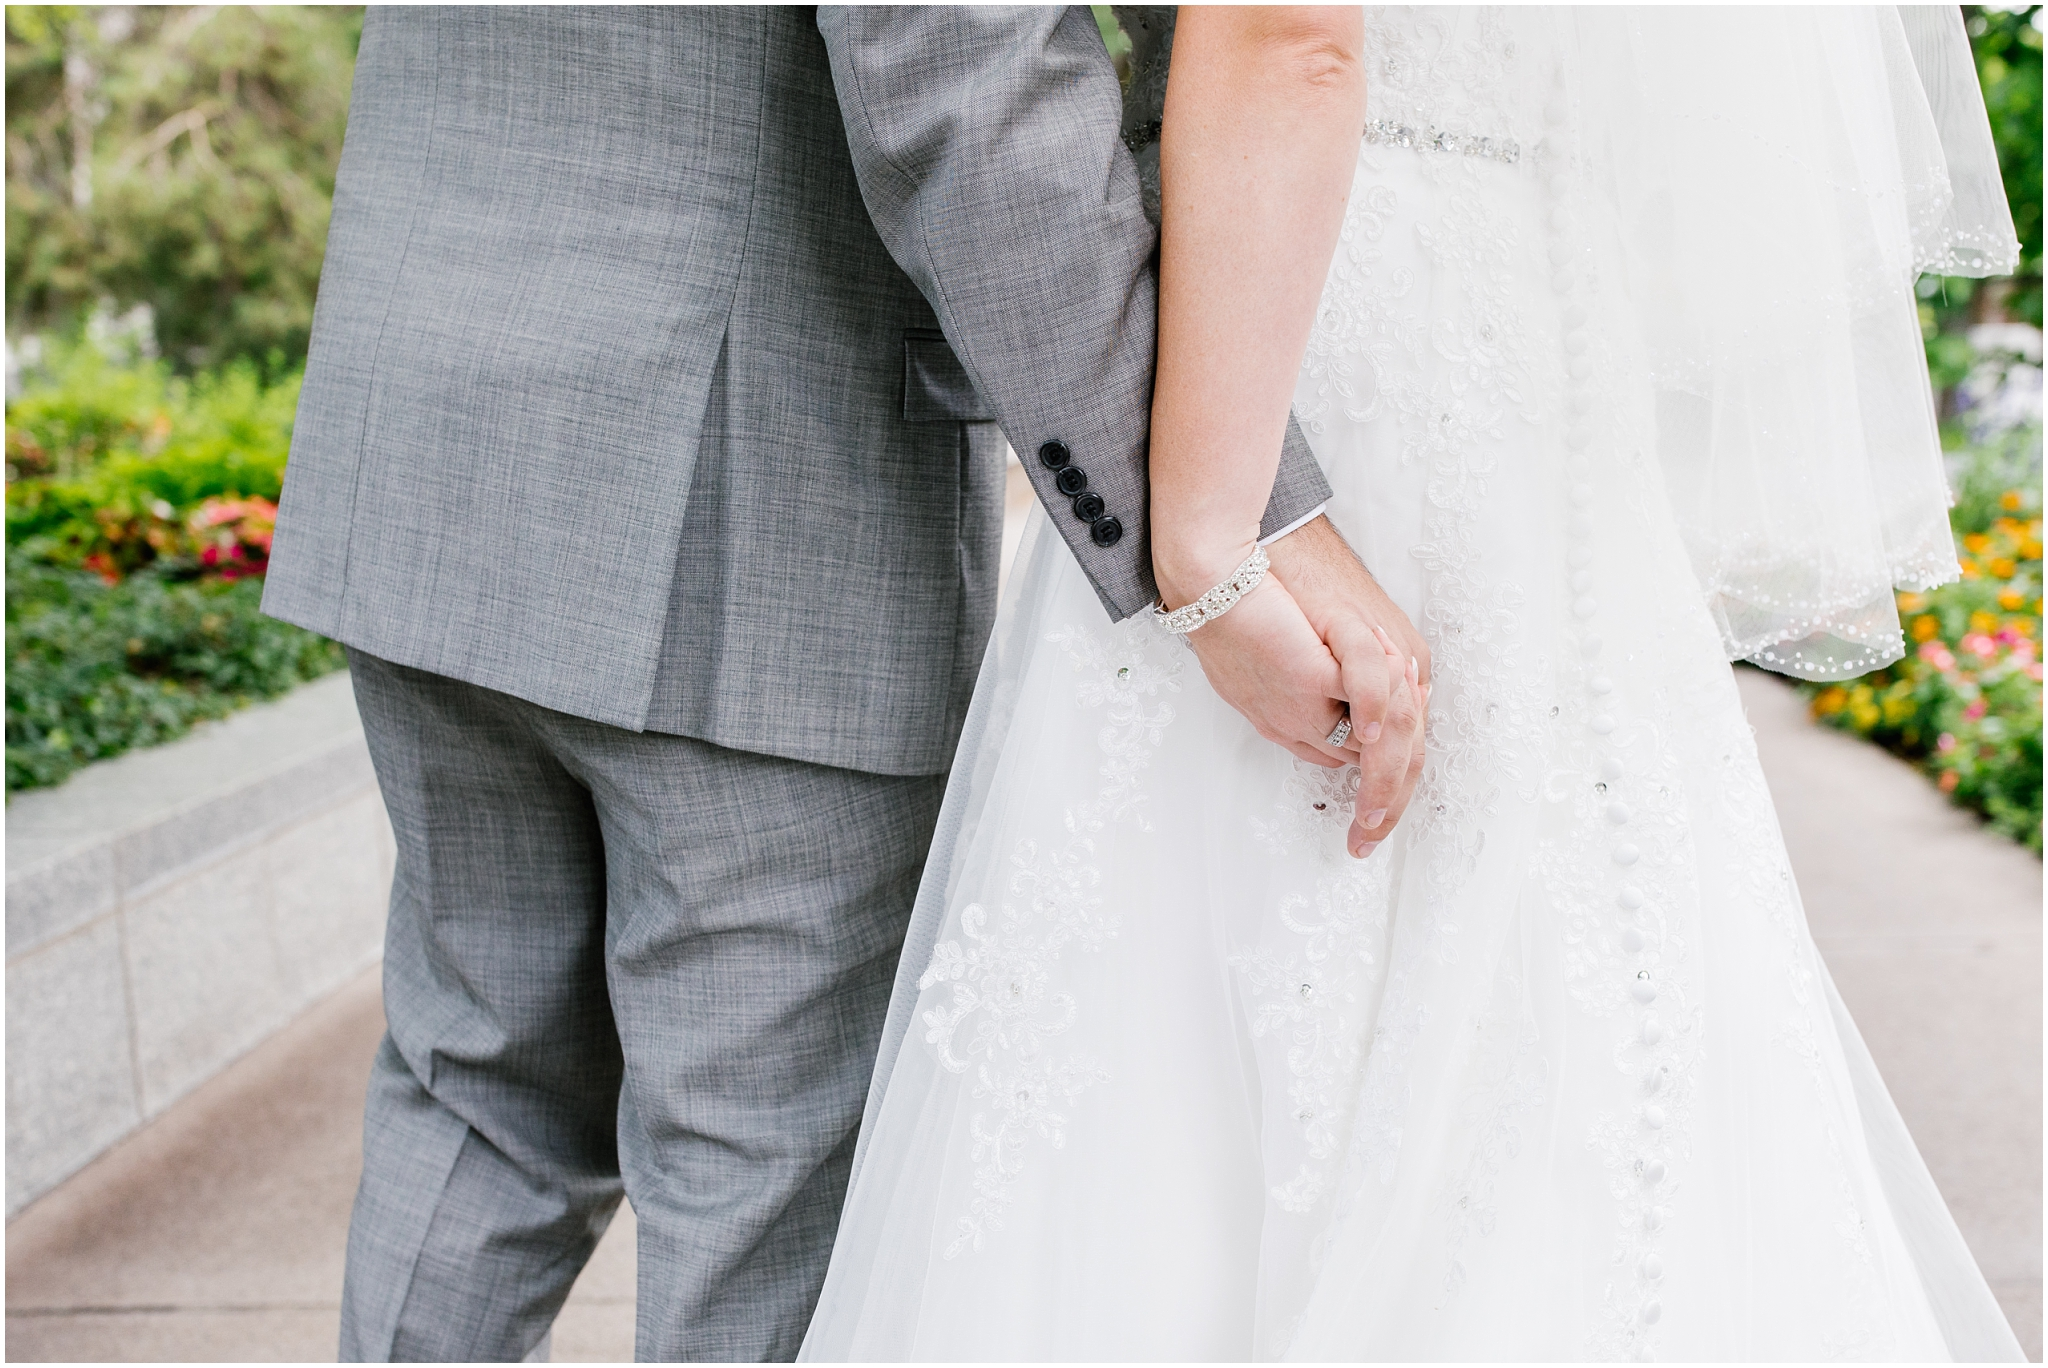 Justin and Melissa-182_Lizzie-B-Imagery-Utah-Wedding-Photographer-Salt-Lake-City-Temple-The-Grand-Ballroom.jpg